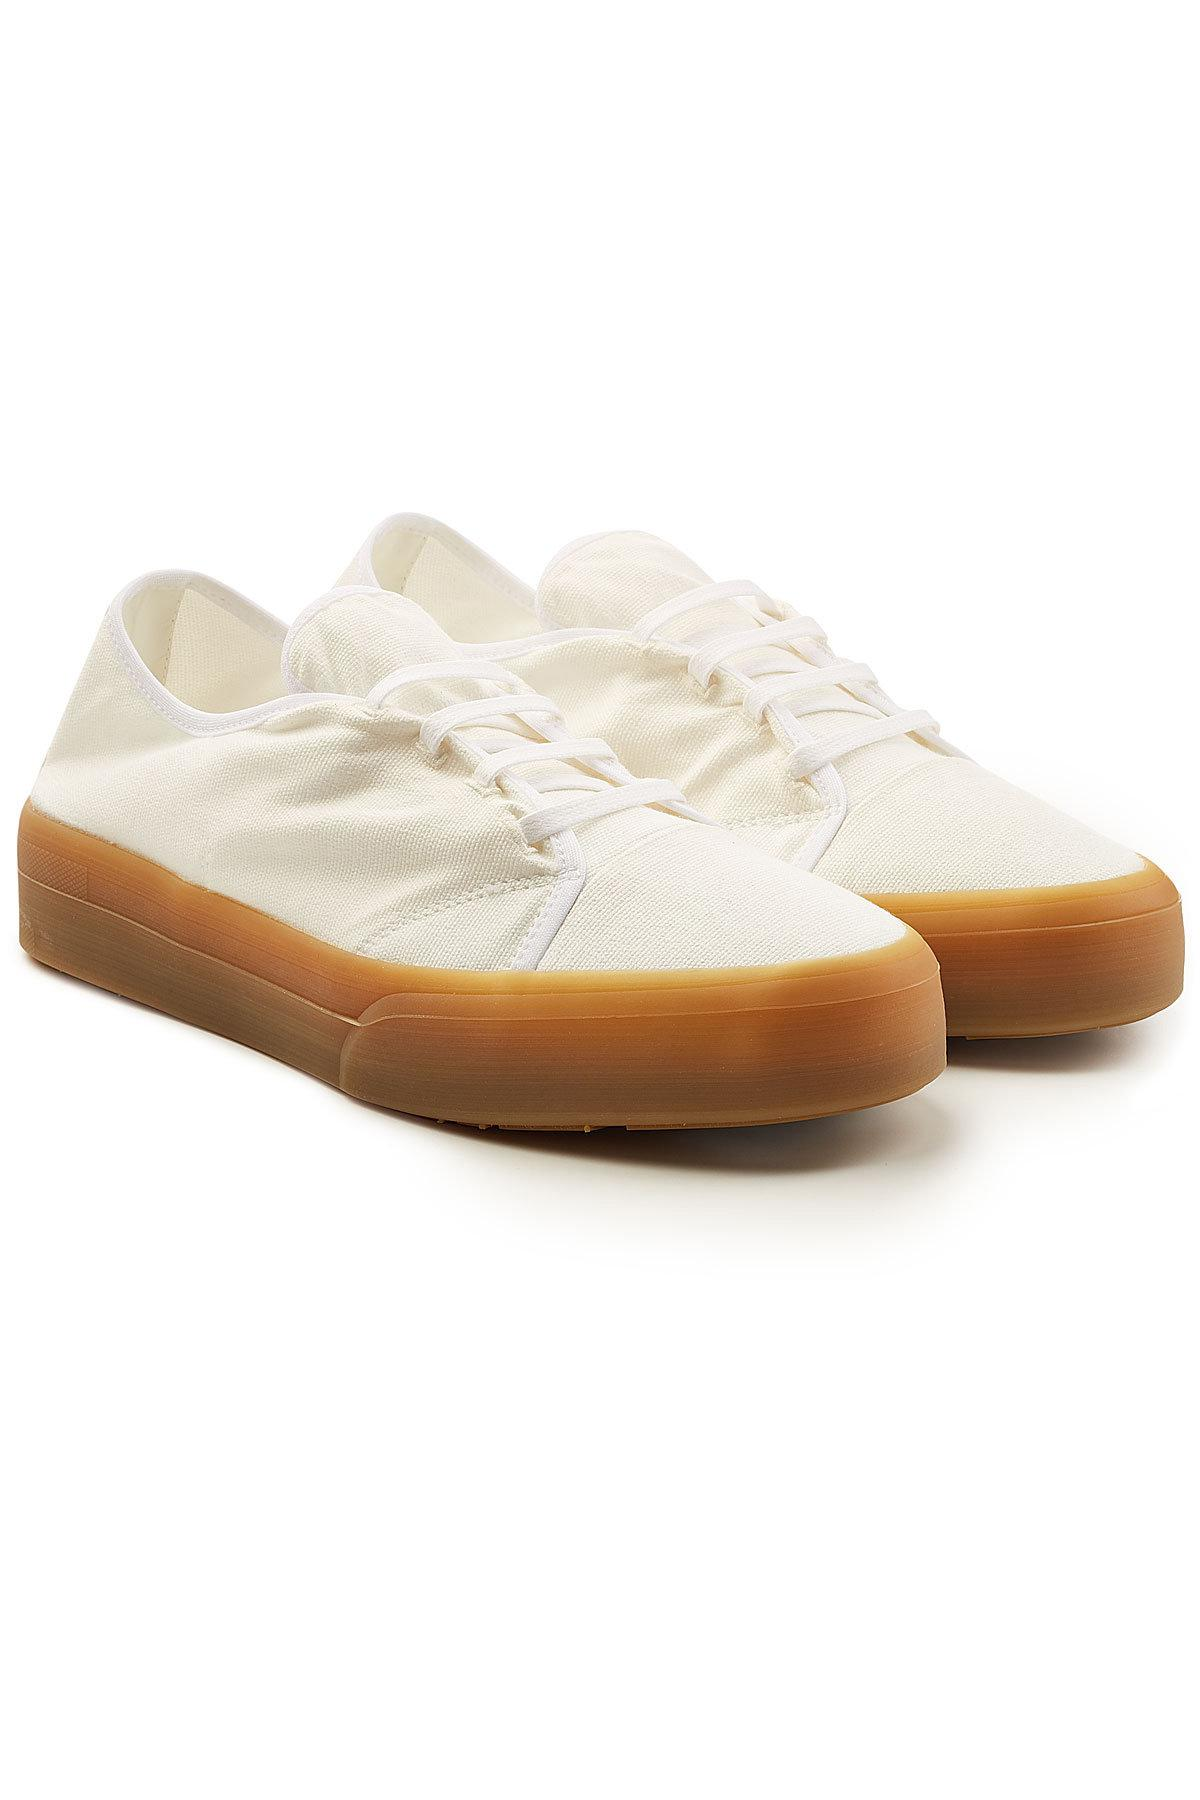 Jil SanderCanvas High-Top Sneakers OiLst6P